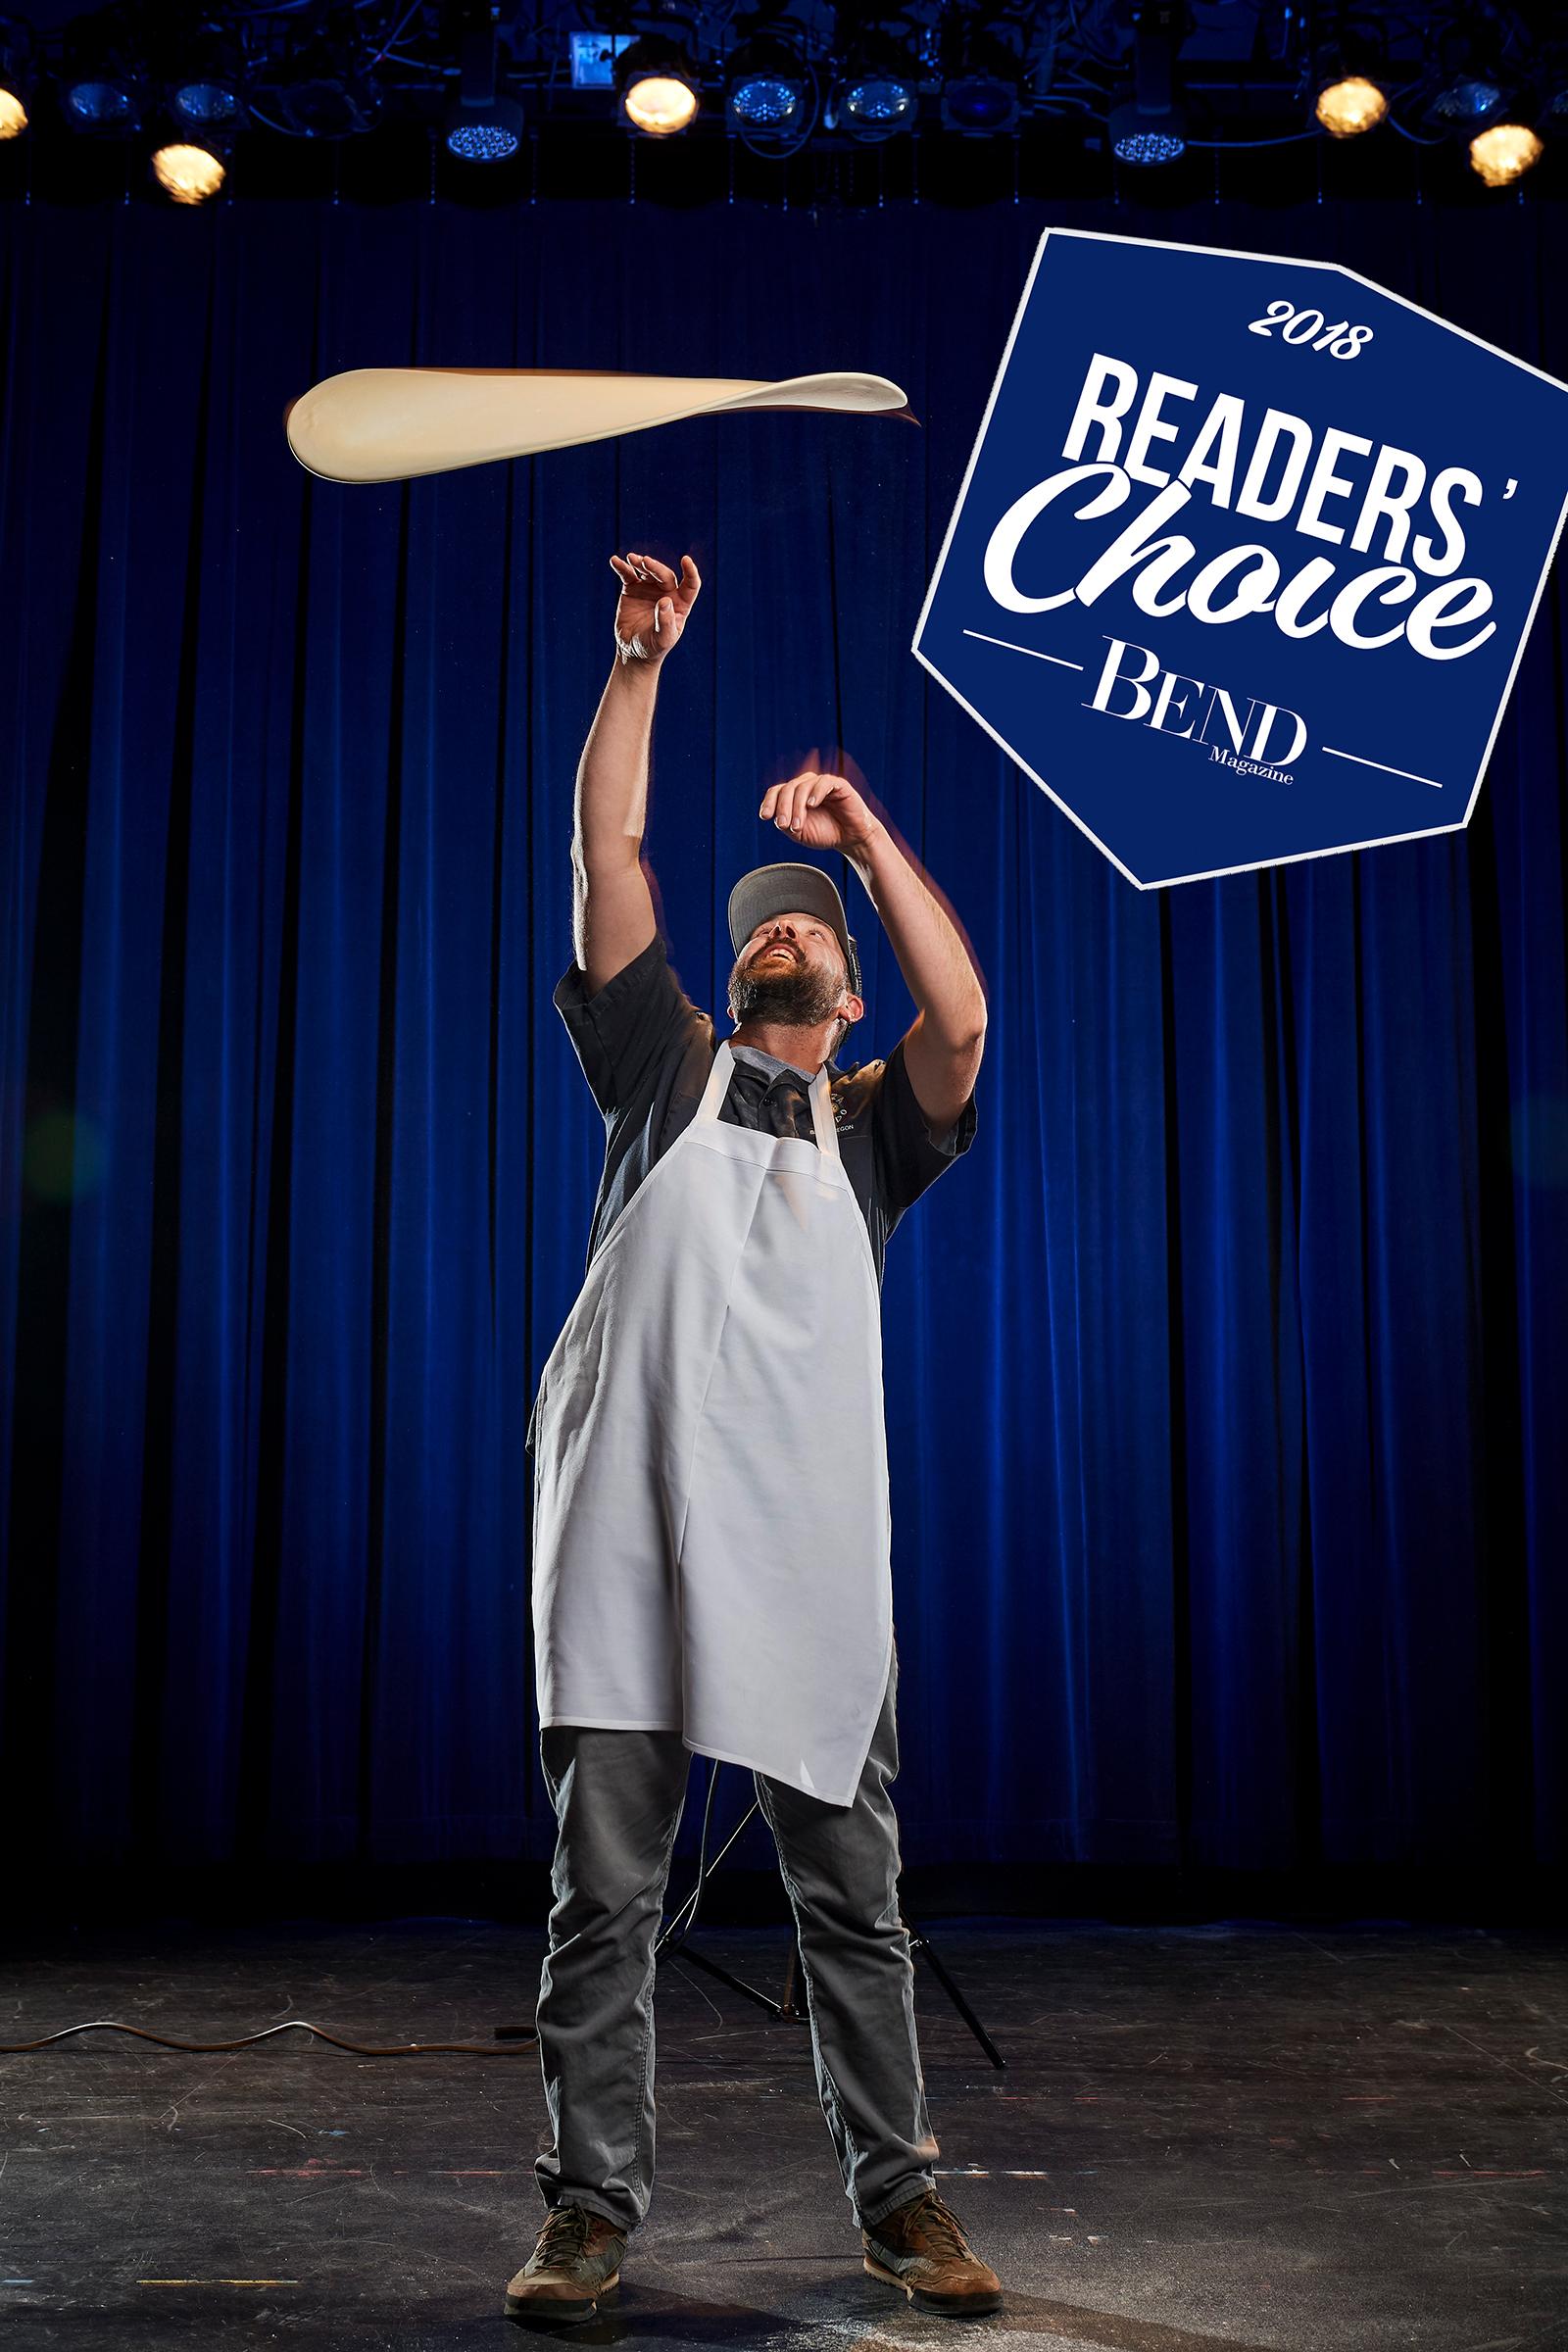 Pizza-Mondo_Bend-Mag-Readers-Choice_2018_sm